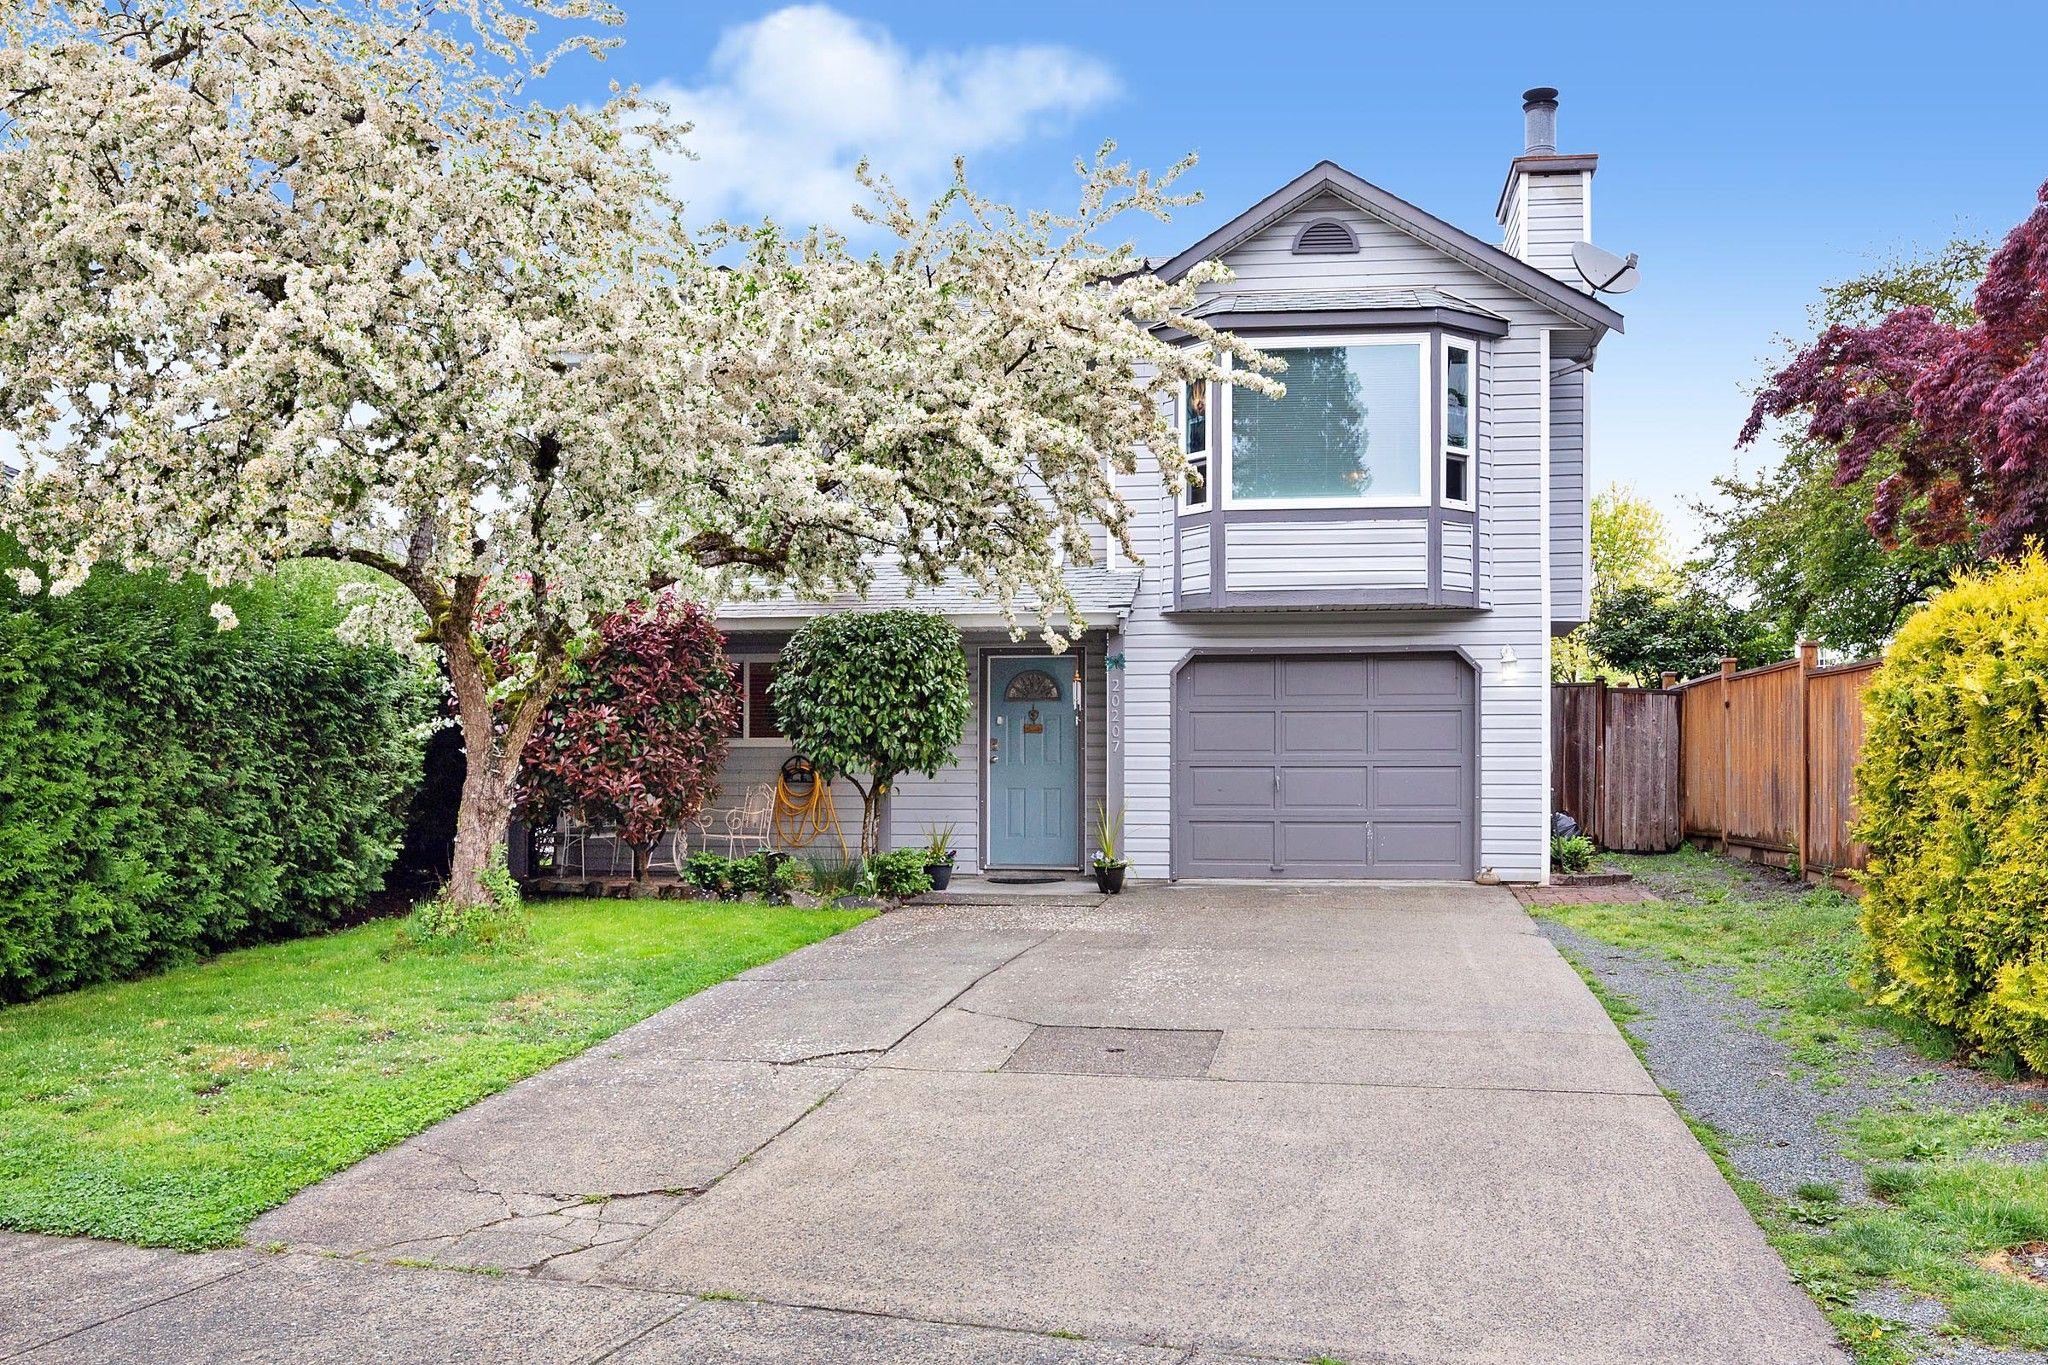 Main Photo: 20207 116B Avenue in Maple Ridge: Southwest Maple Ridge House for sale : MLS®# R2580236